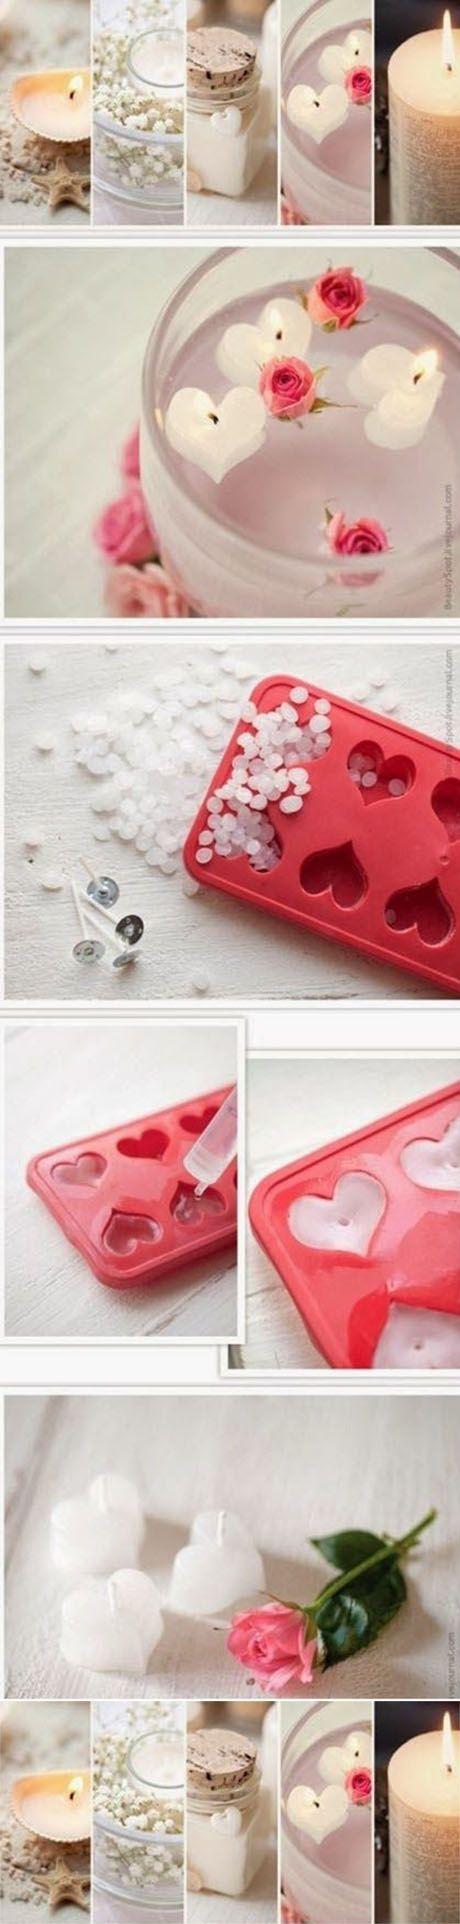 Diy Heart-shaped Candle | DIY & Crafts Tutorials